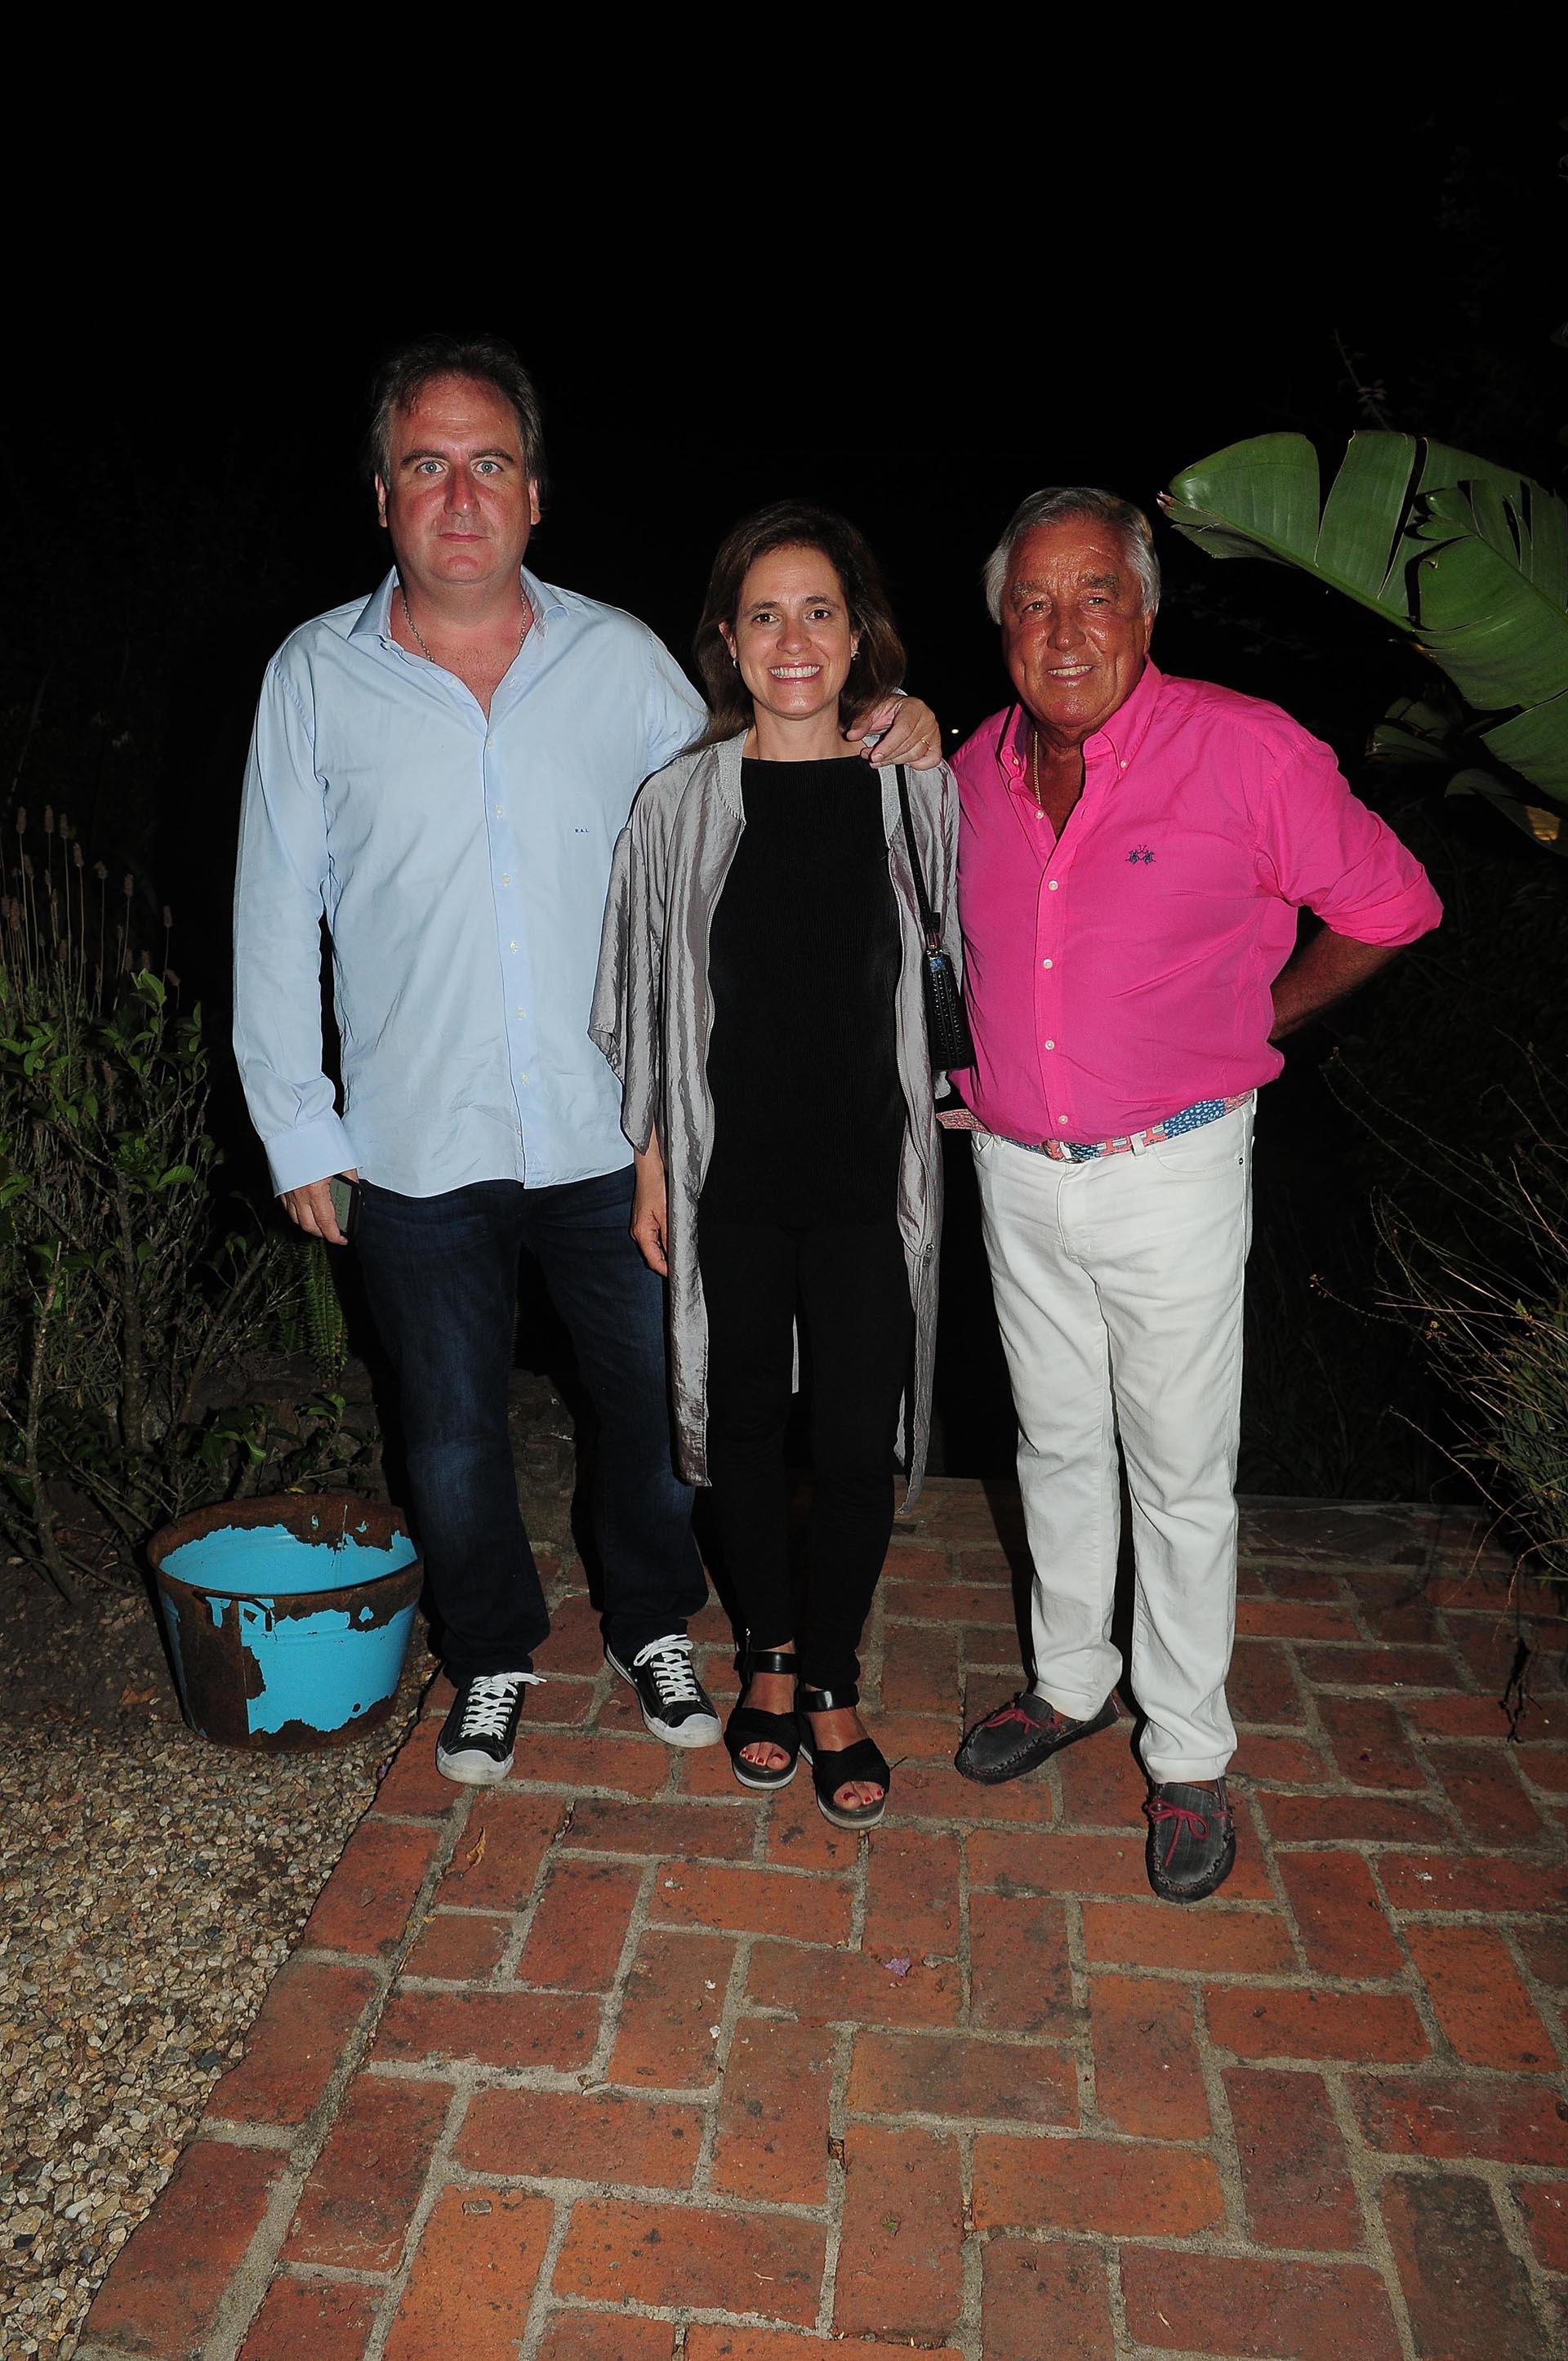 Tato Lanusse, Silvina Pueyrredon y Julio De Marco